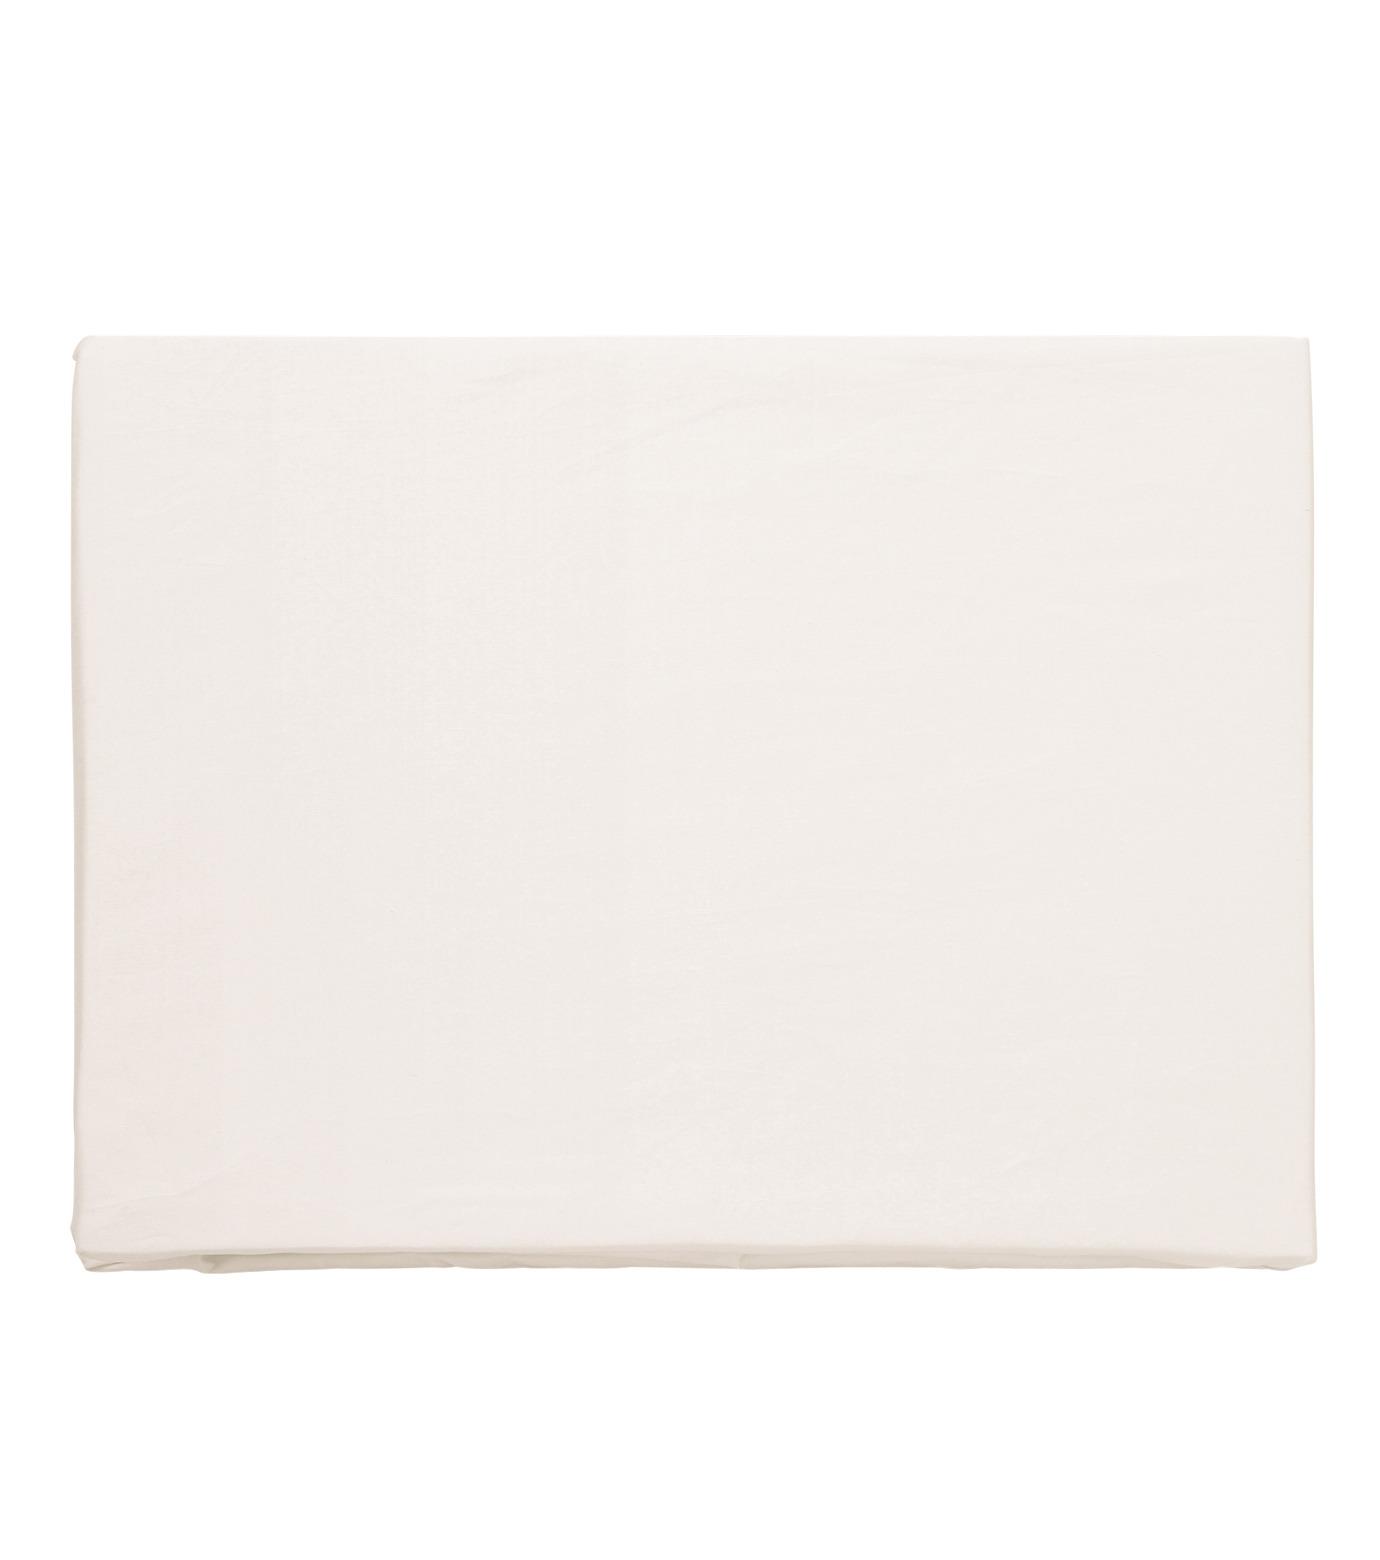 HEY YOU !(ヘイユウ)のDuvet cover/king-WHITE(インテリア/interior)-duvetcover-K-4 拡大詳細画像1